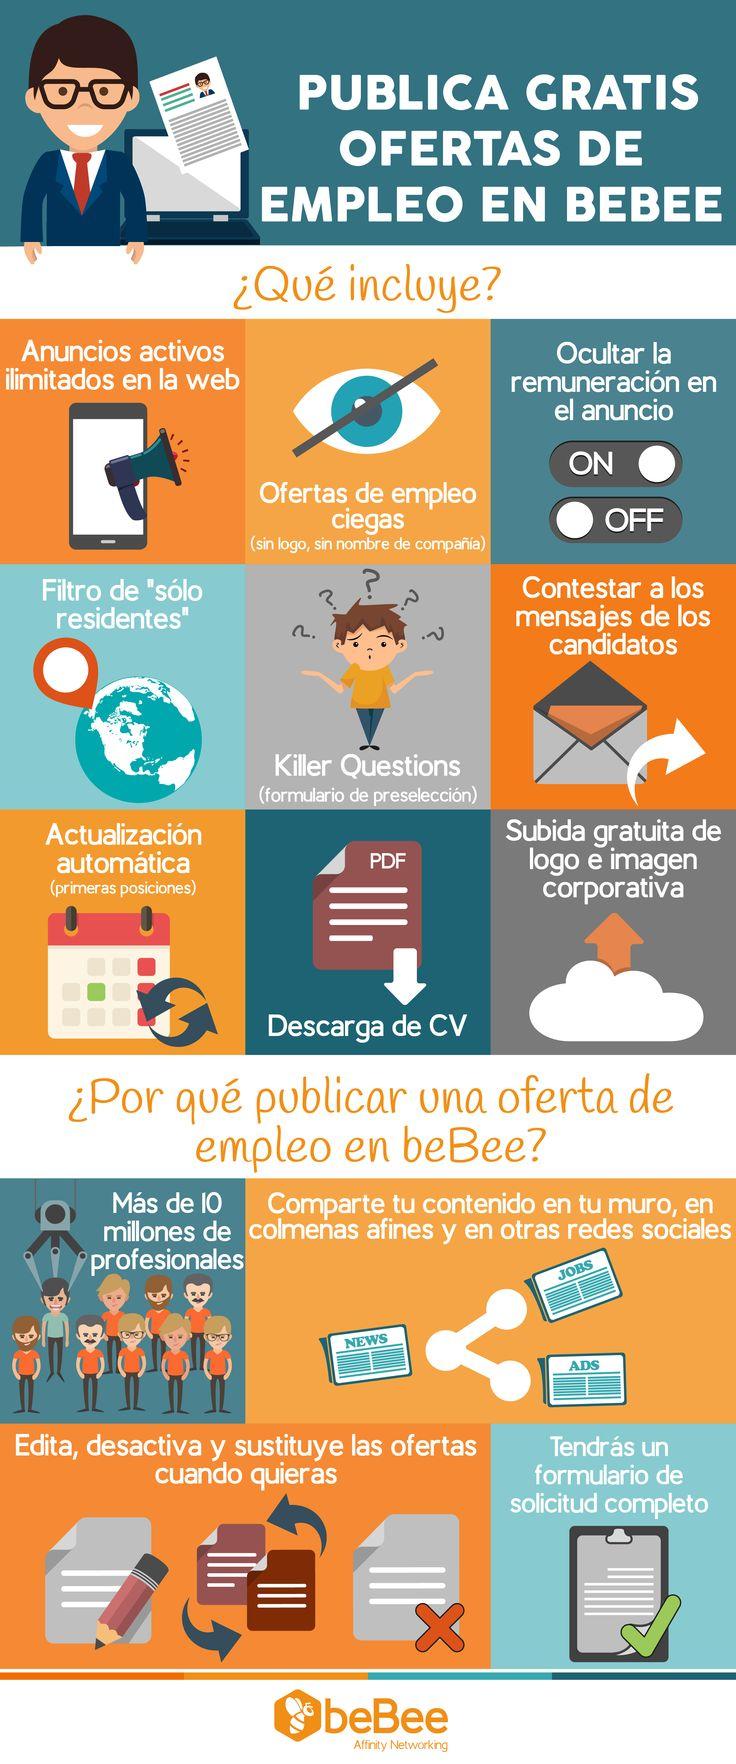 ¡Publica gratis ofertas de empleo en beBee! #Infografia